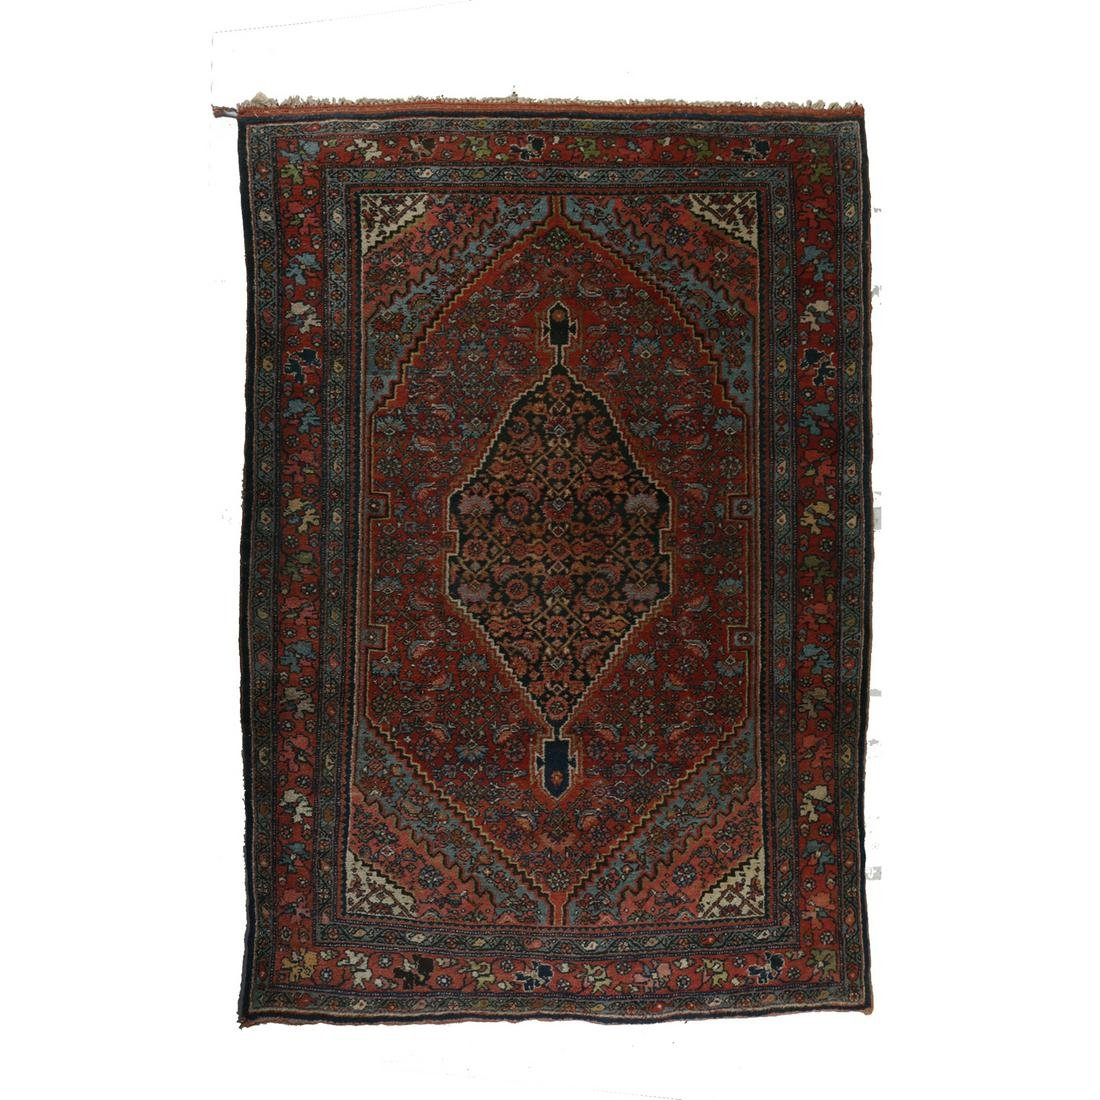 Antique Persian Bidjar Stylized Floral Area Rug, c1920